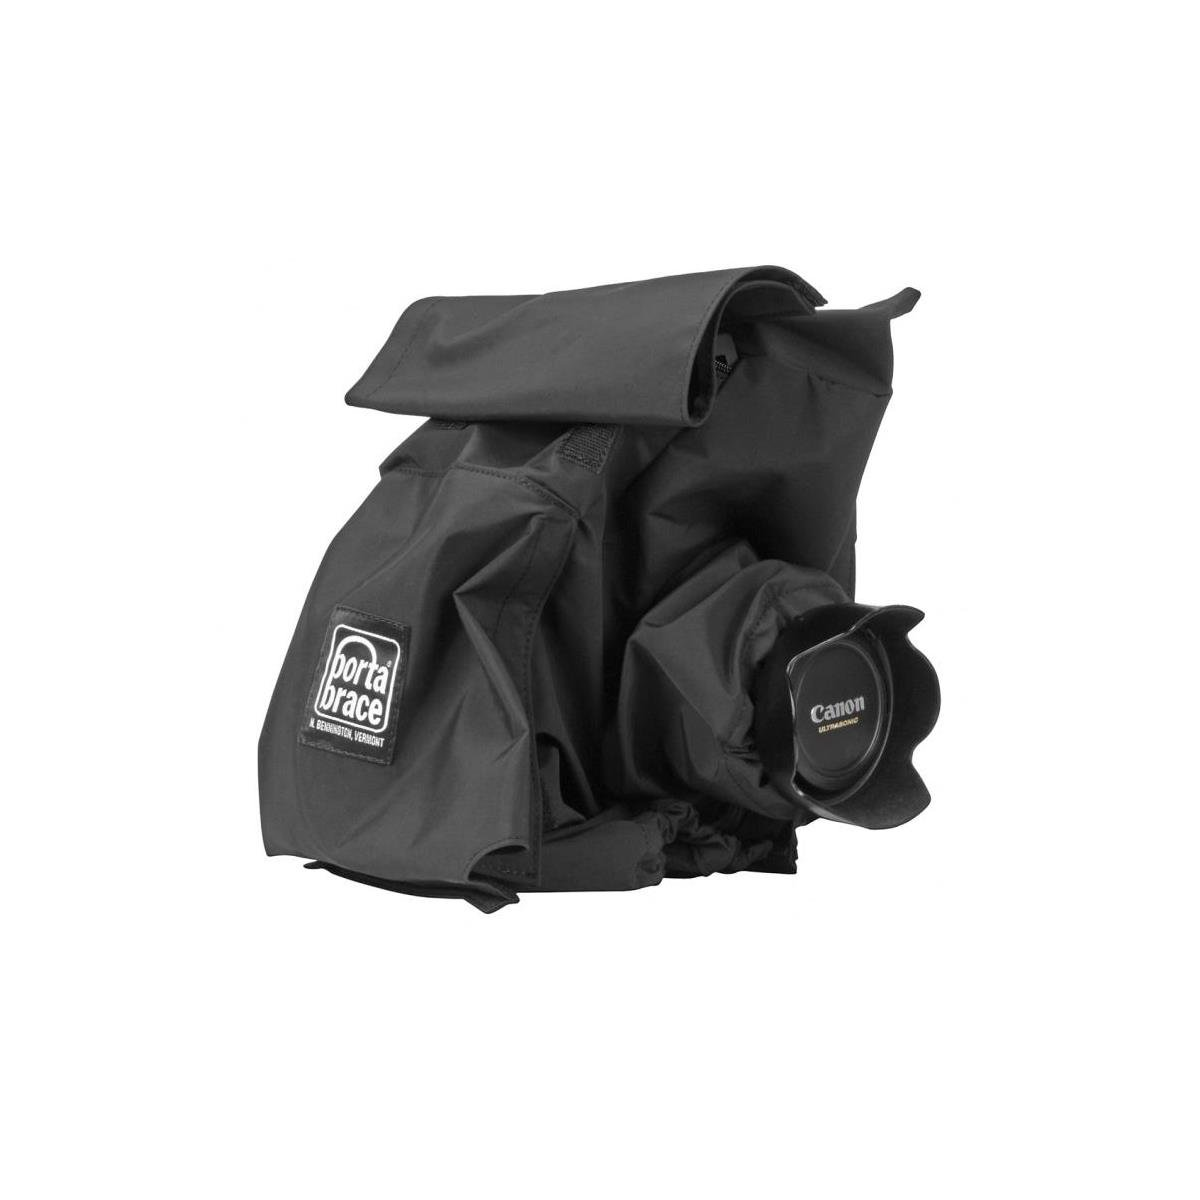 PortaBrace RS-C100 Rain Cover, Cannon C-100, Black Rain Cover by PortaBrace